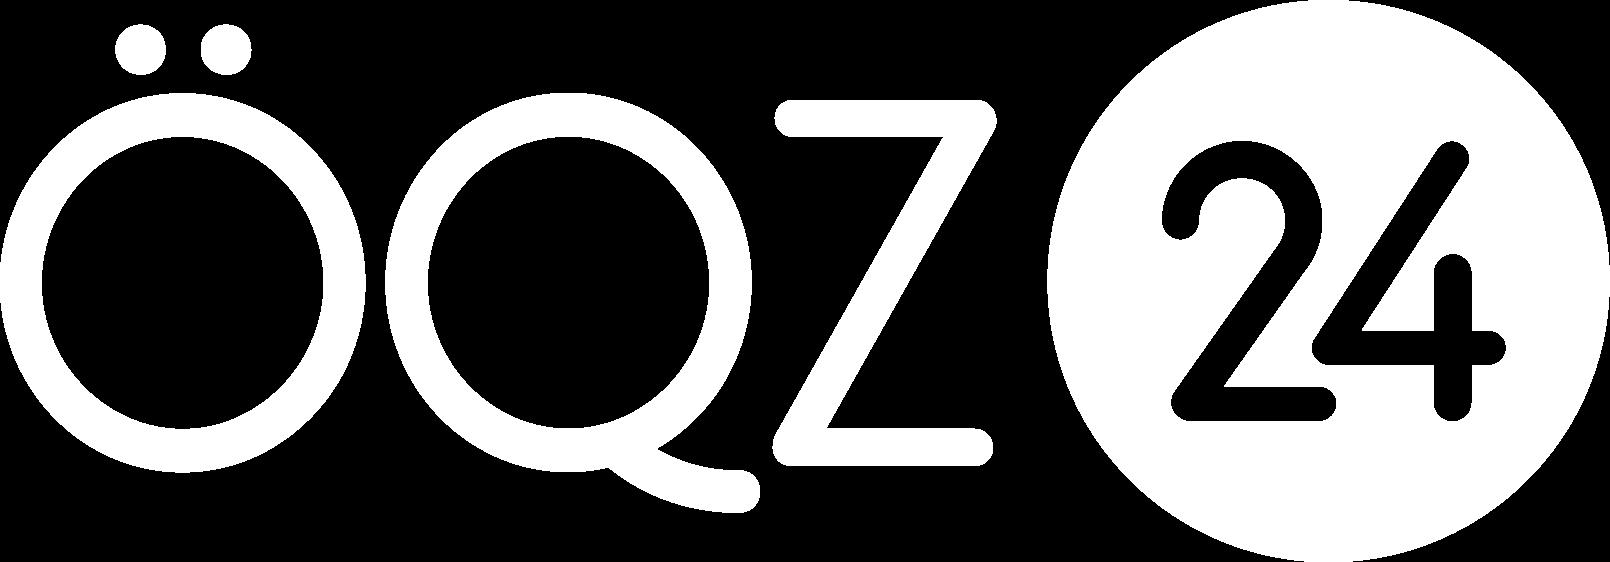 Logo Zertifizierungseinrichtung